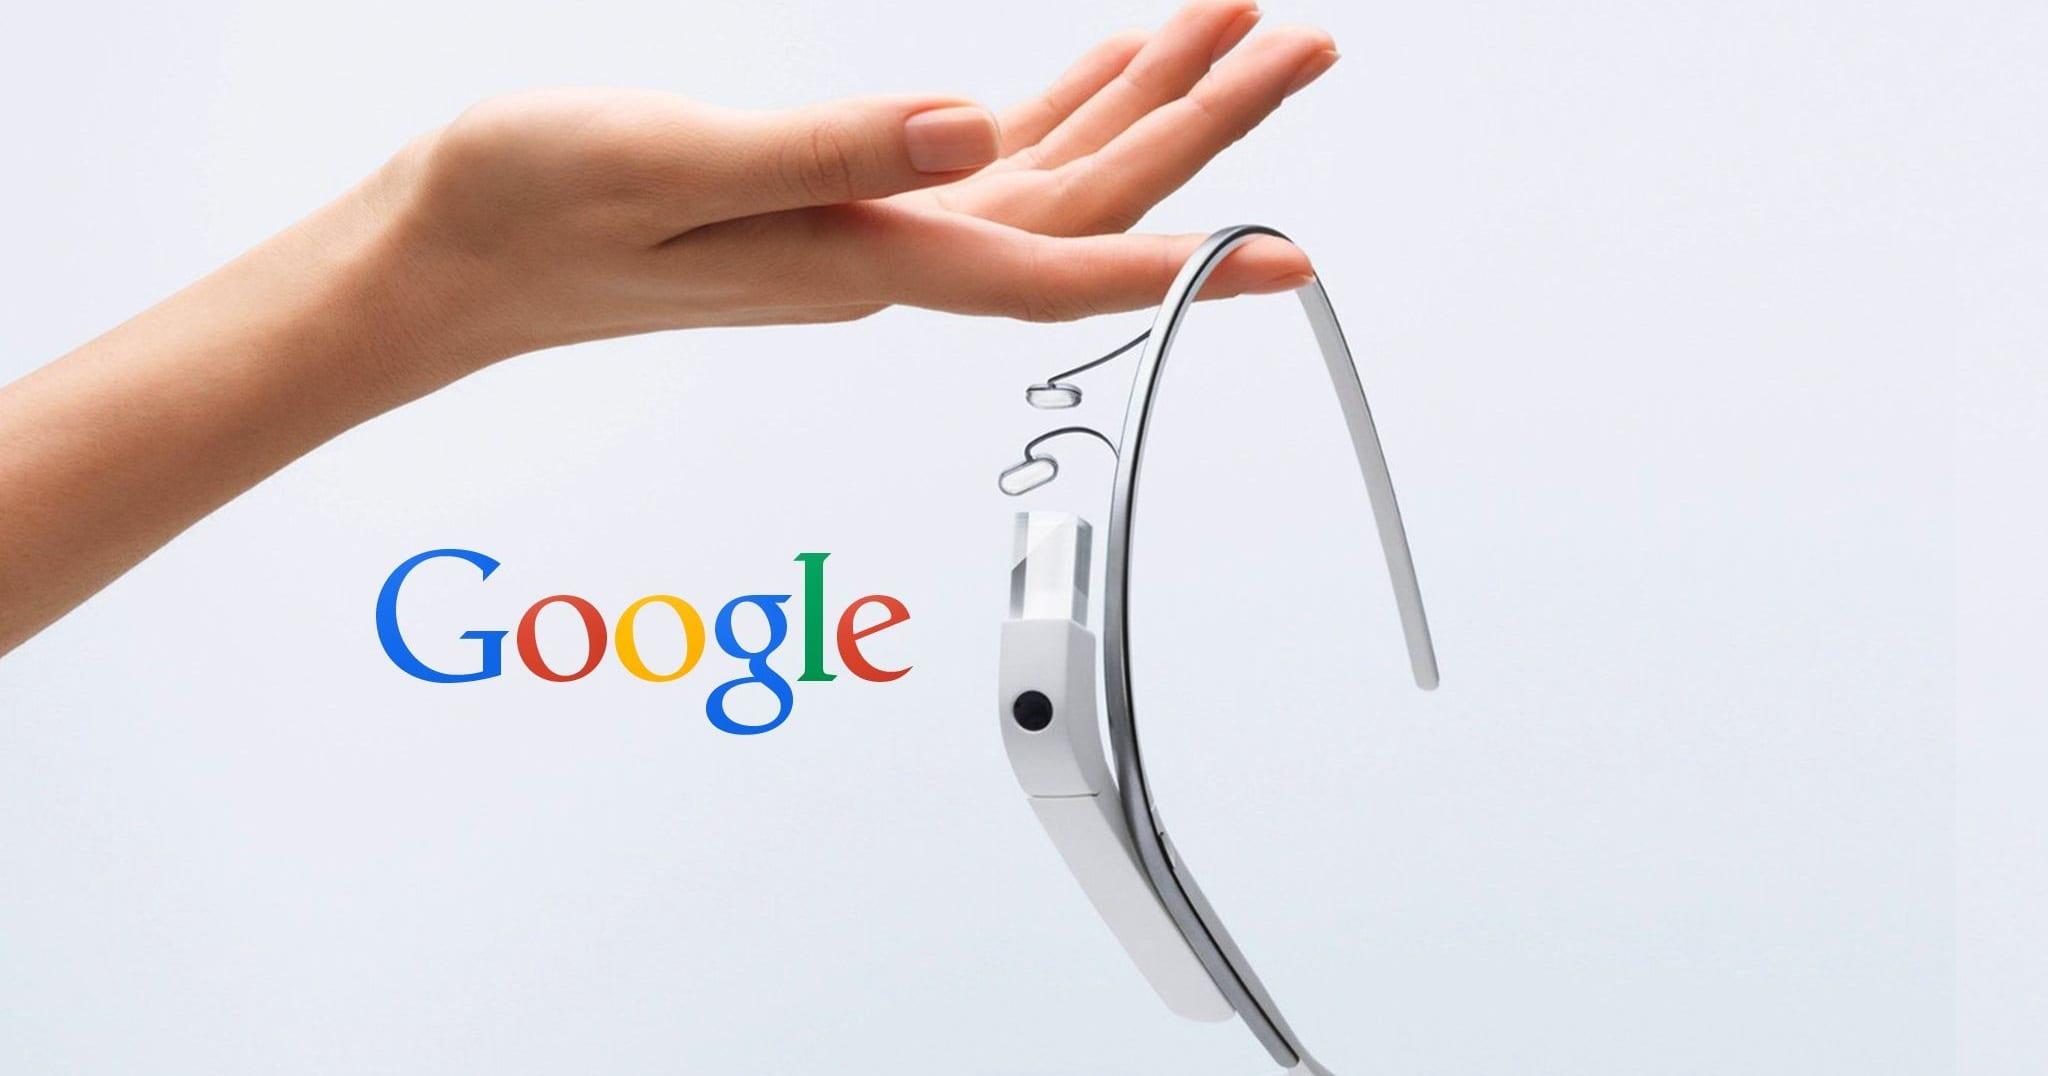 Google Glass is not dead : Job hiring spree at Google hints return of family of Google Glass v2.0